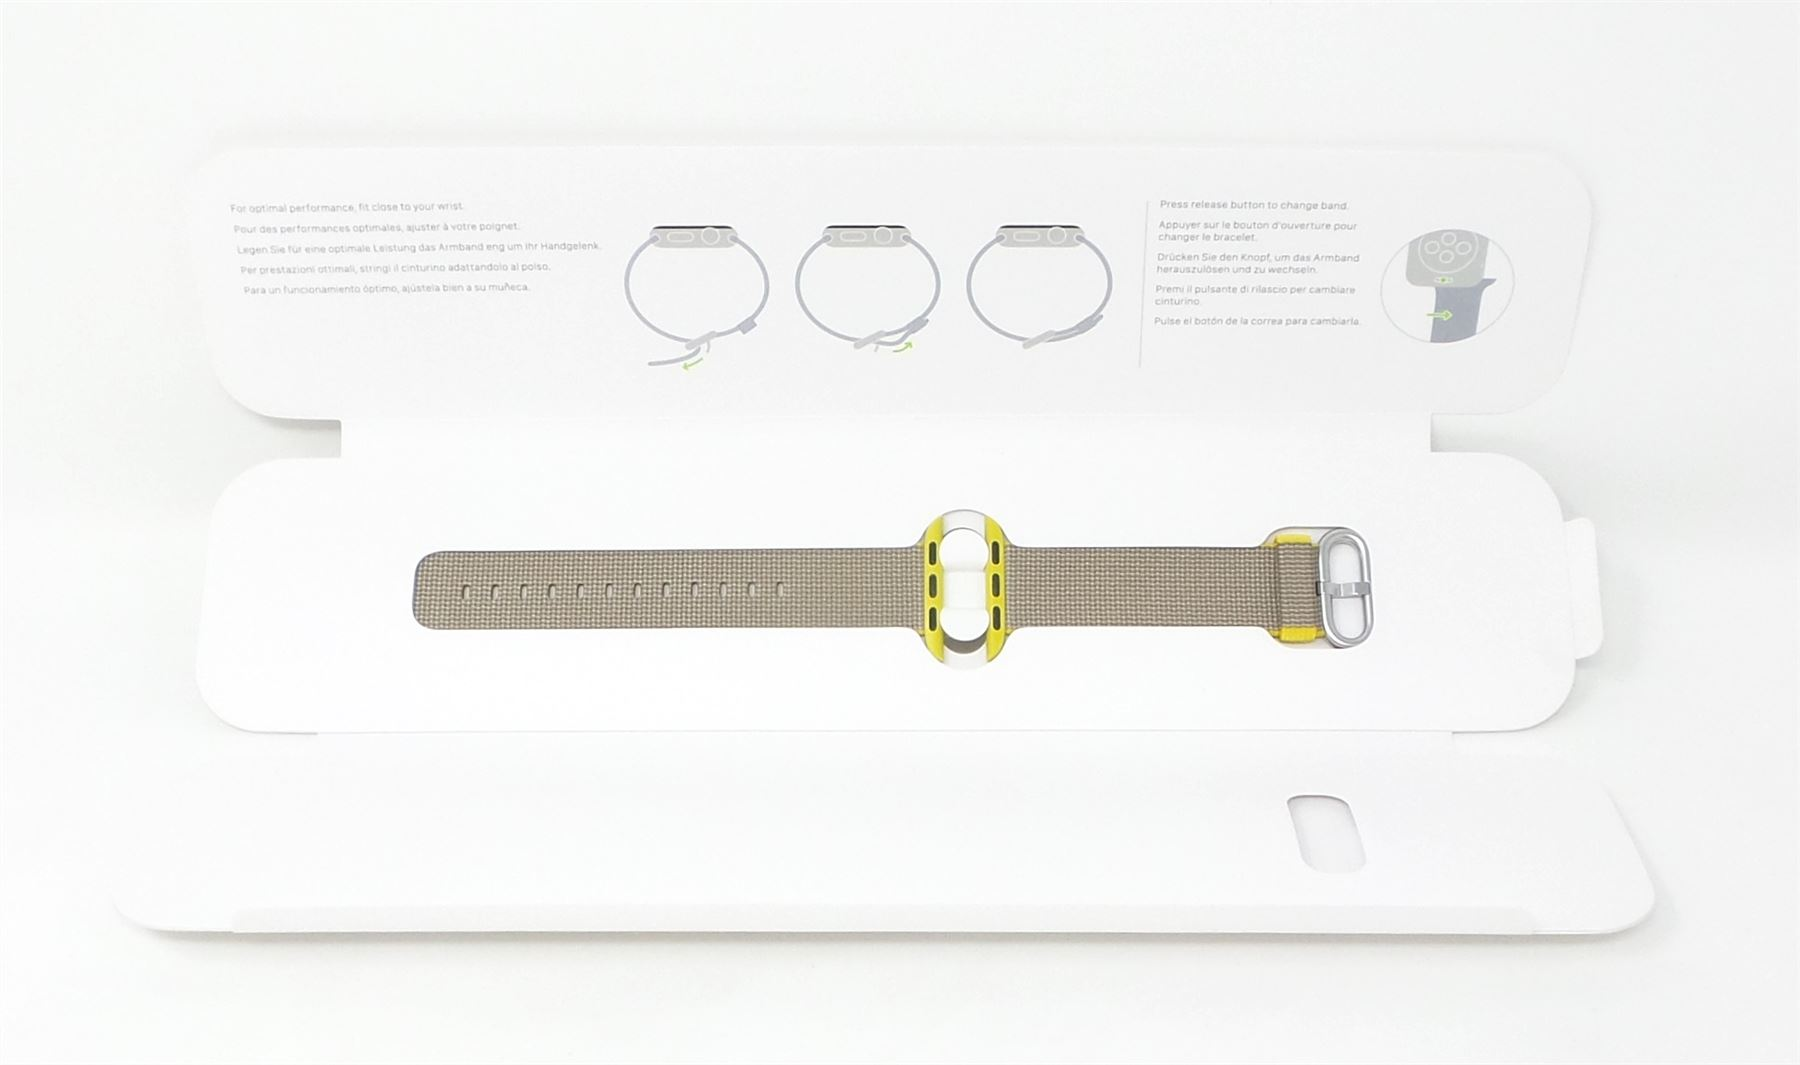 Apple Watch Woven Nylon Band 38mm Yellow Light Gray